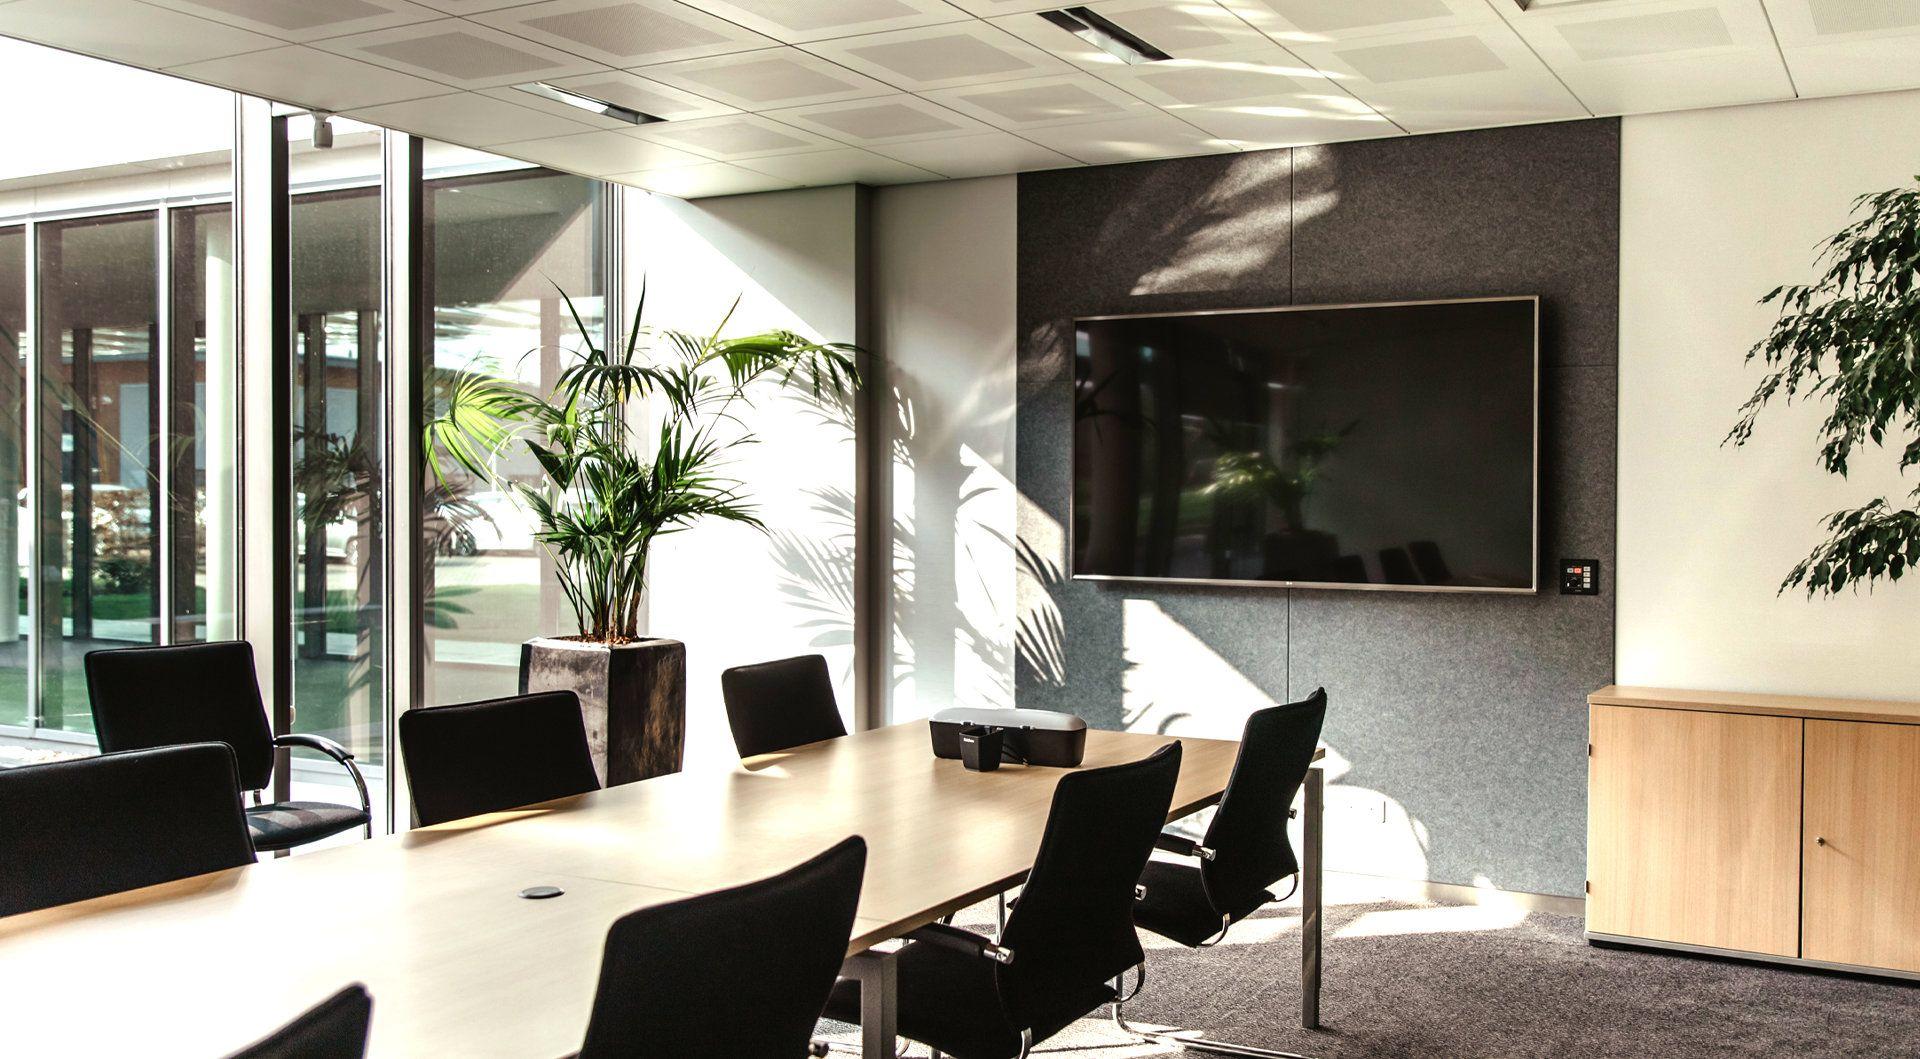 "Benq PL552 139,7 cm (55"") LED Full HD Interactief flatscreen Zwart - Case studie de vries"